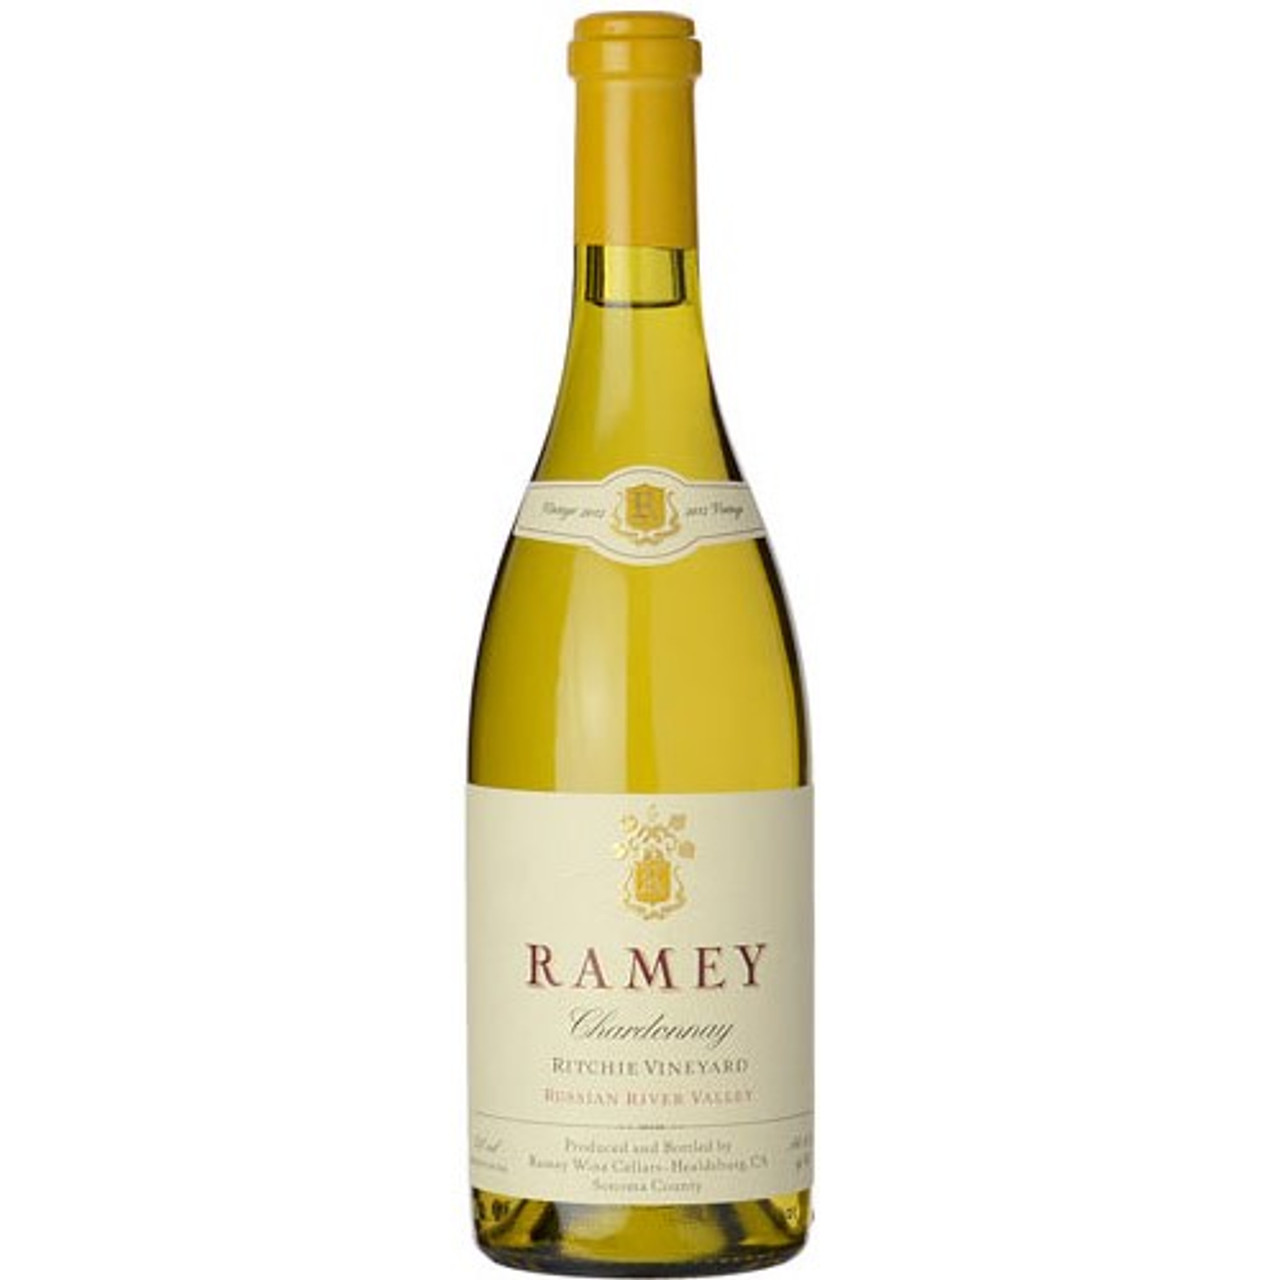 Ramey, Chardonnay, Ritchie Vineyard, Russian River Valley 2014